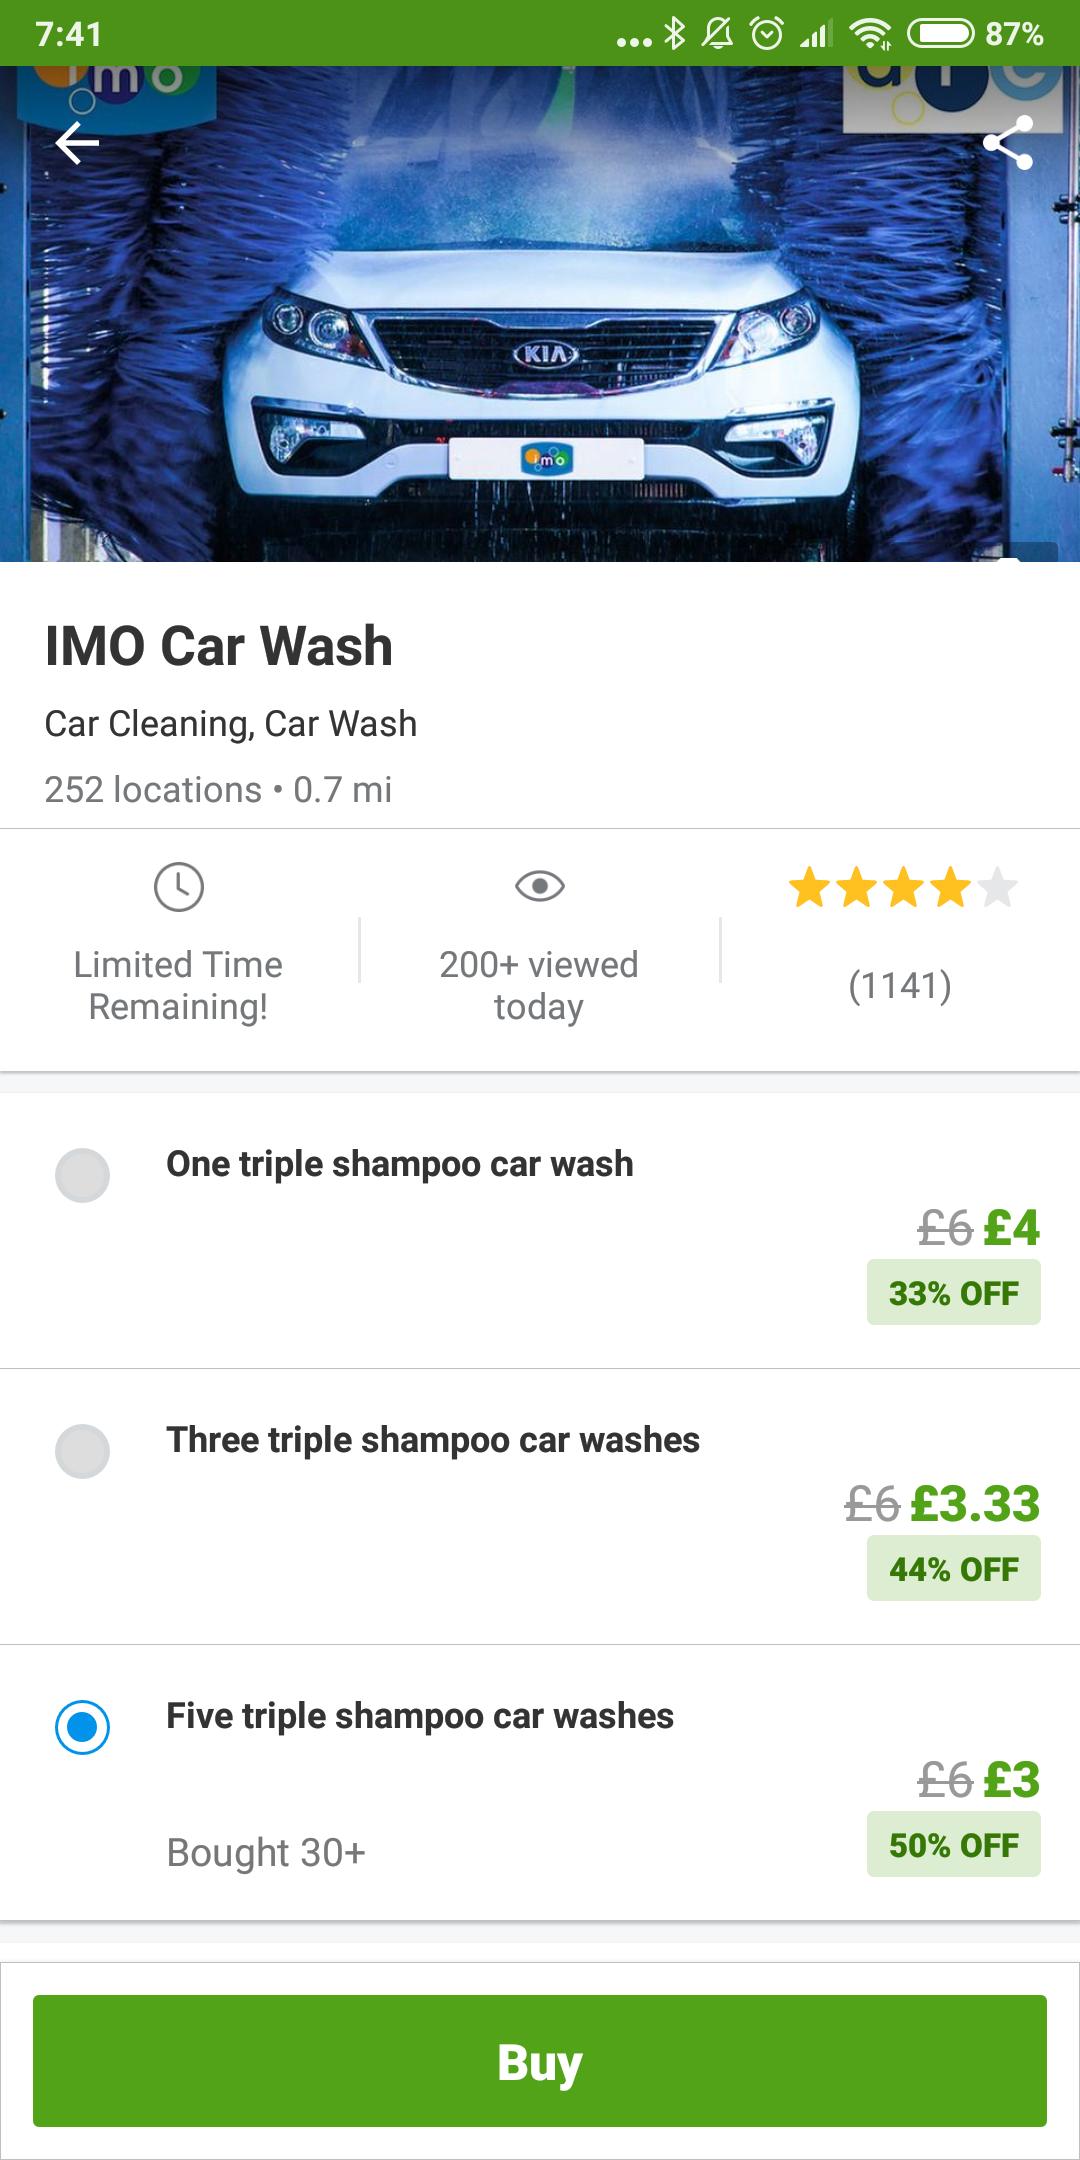 IMO Car Wash Five triple shampoo car washes £3 Groupon Car Wash Glitch (poss £2.55 w/code)